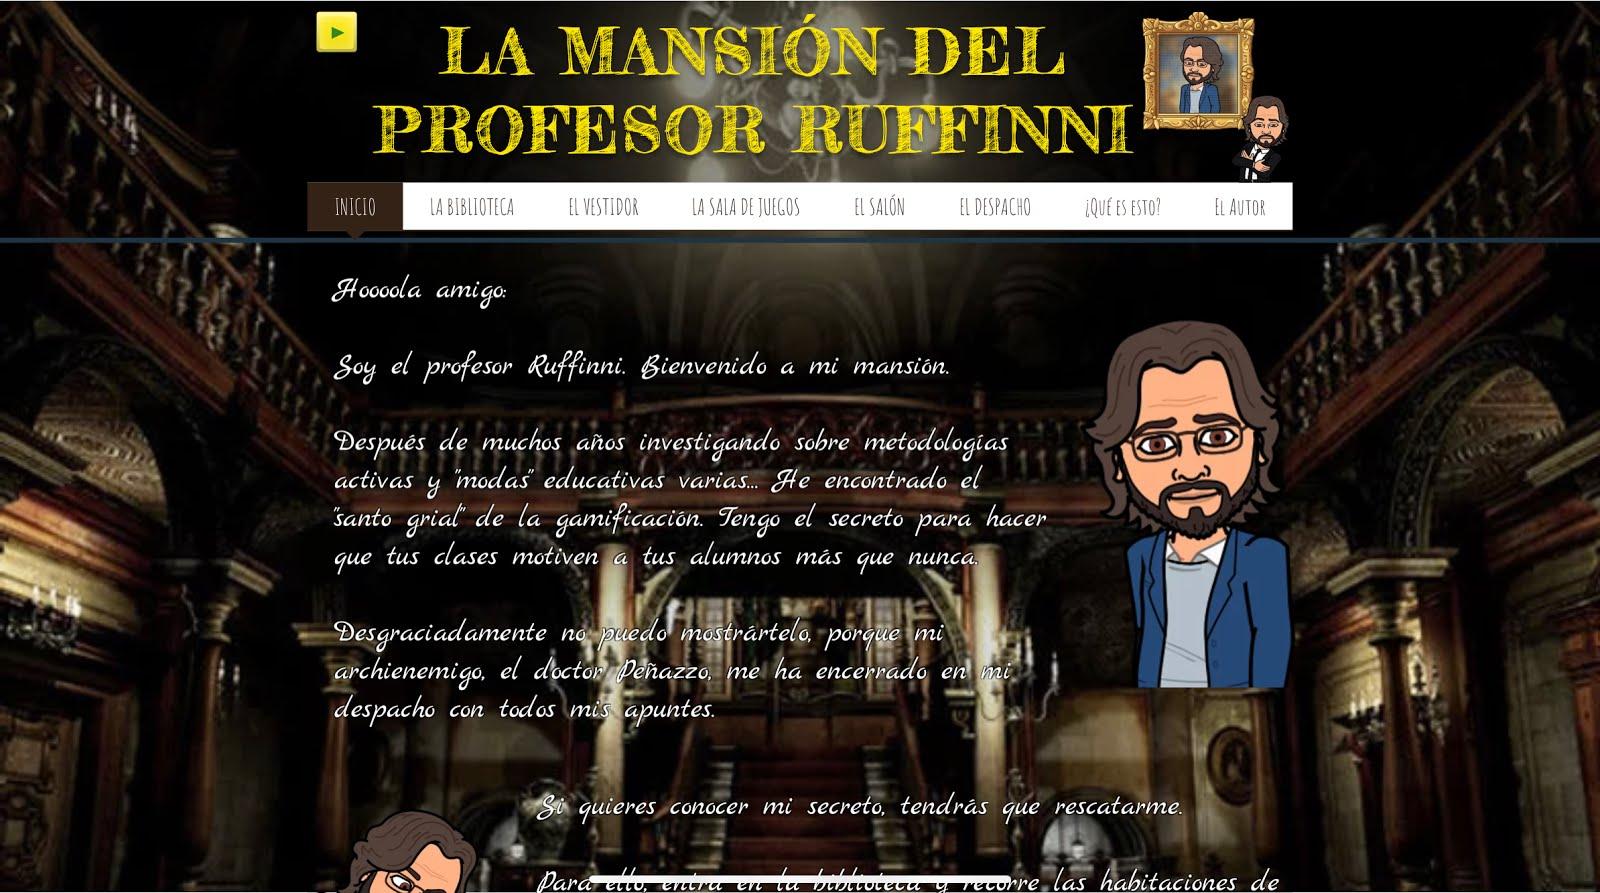 LA MANSIÓN DEL PROFESOR RUFFINNI